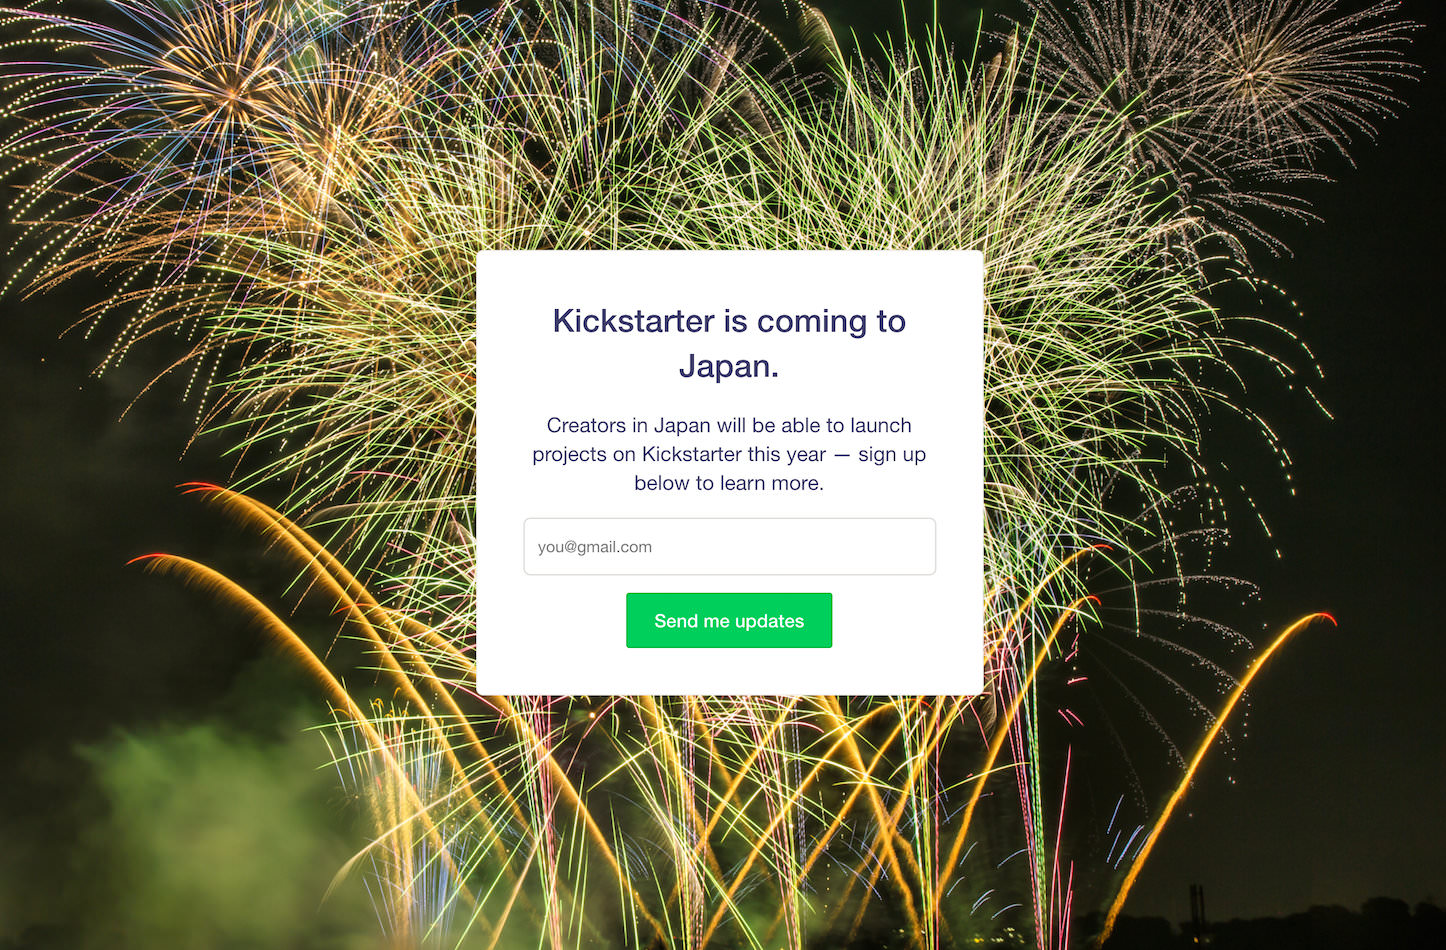 Kickstarter-Coming-to-Japan